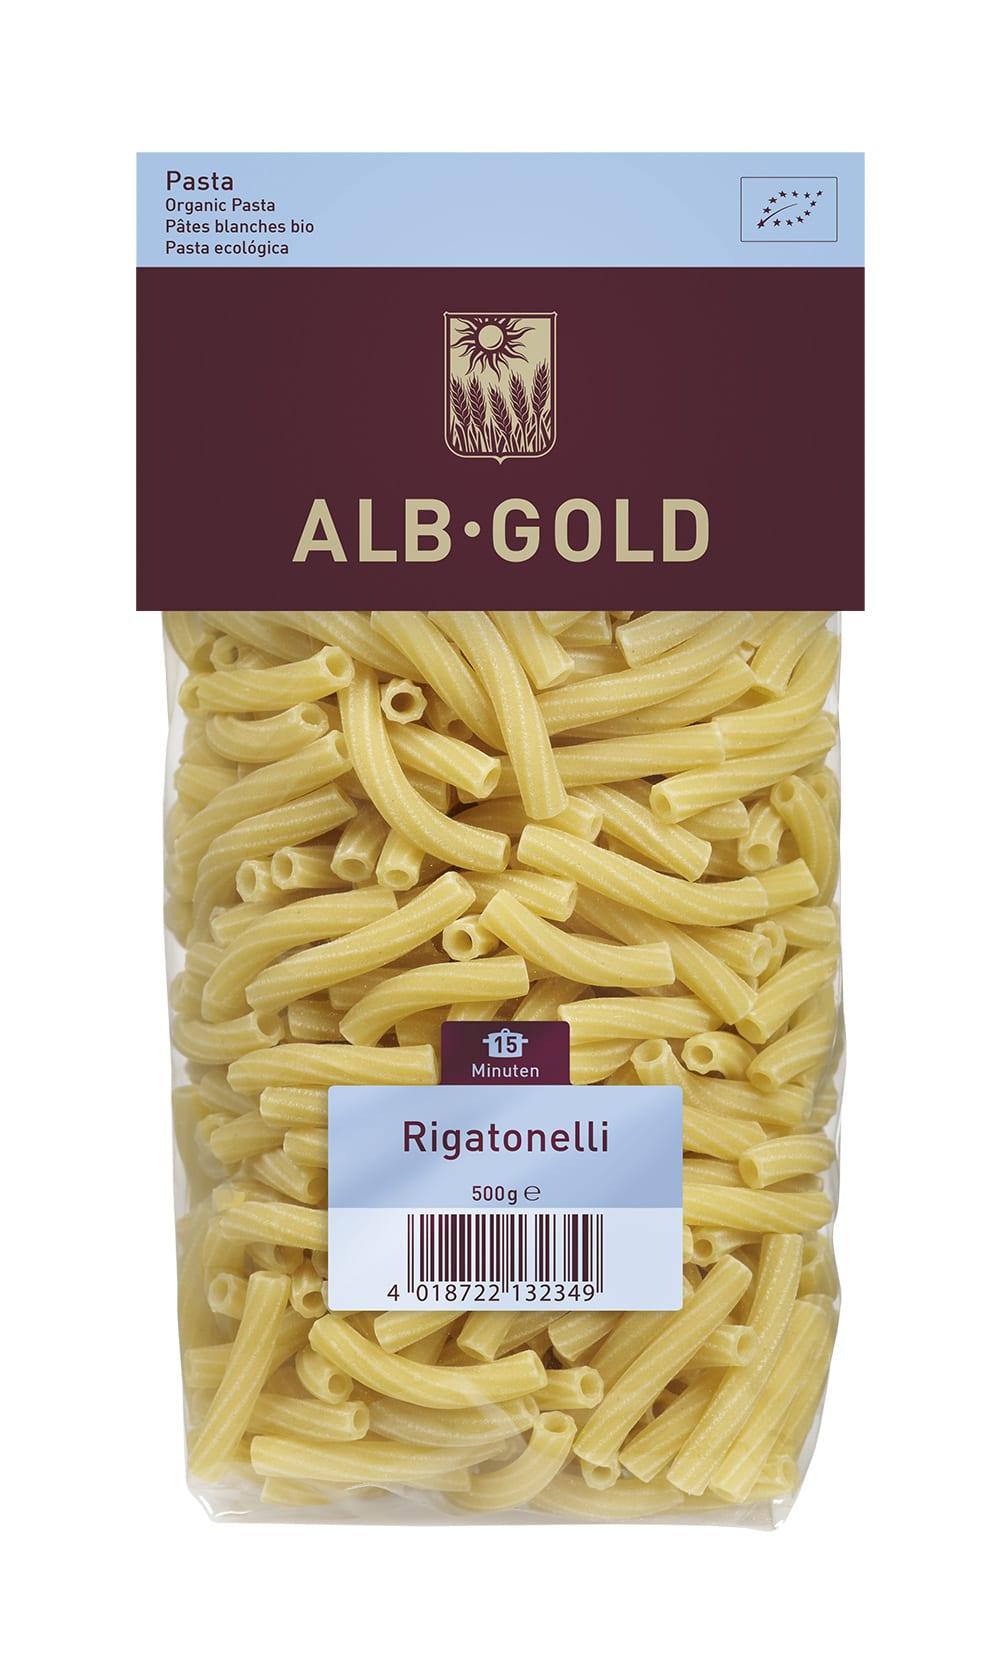 Alb-Gold rigatonelli - ØkoTaste